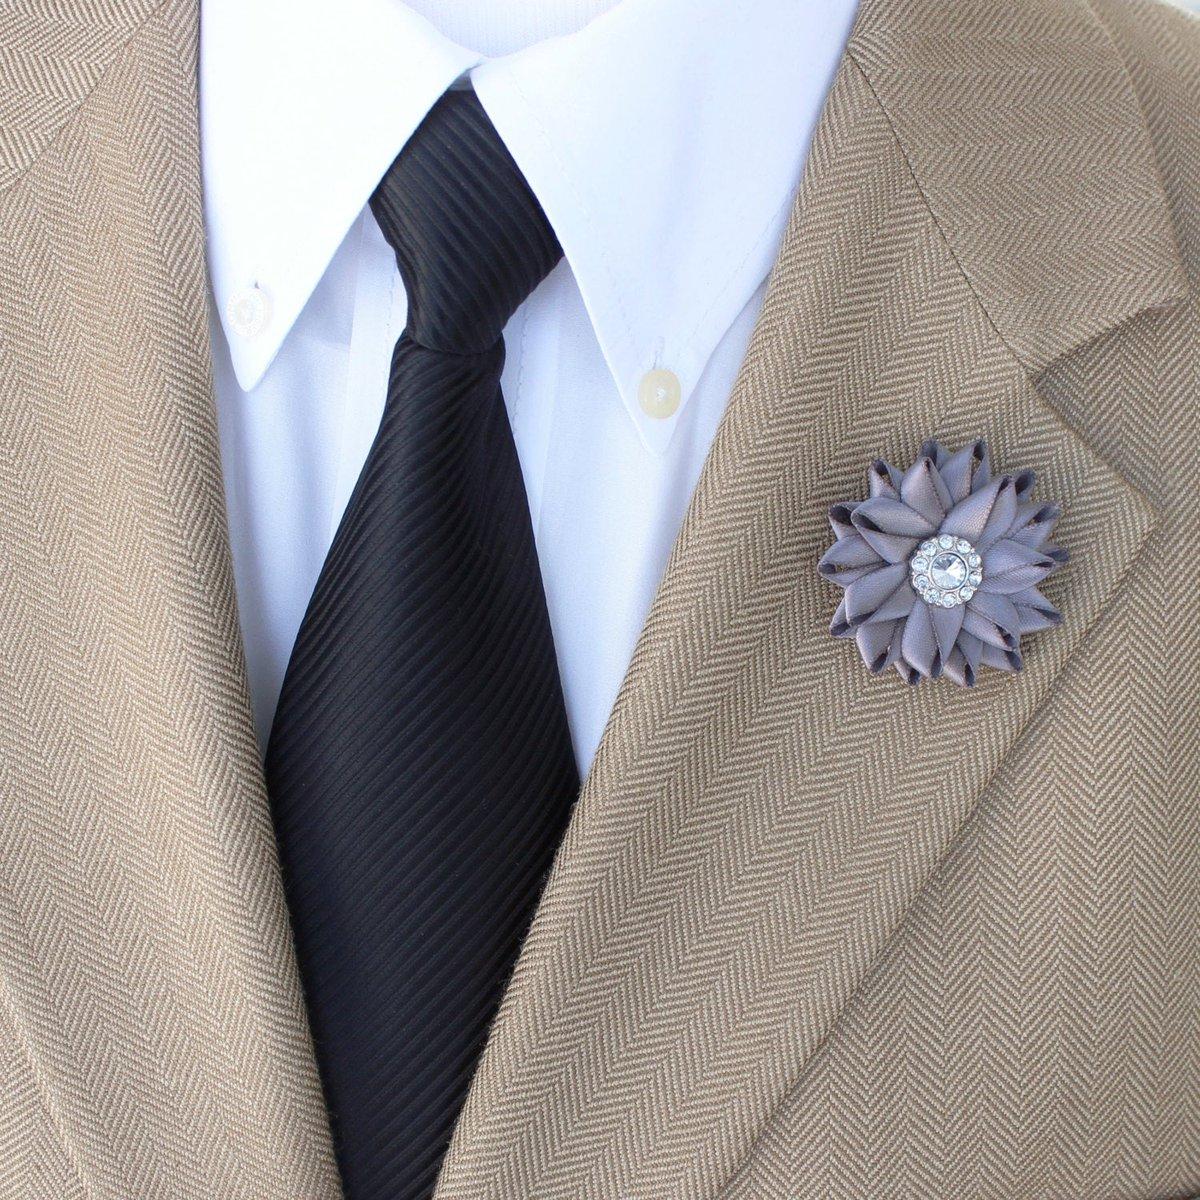 test Twitter Media - Mens Gifts, Lapel Flower, Custom Lapel Pin, Mens Fashion Accessories, Gift for Gentleman, Mens Lapel Flowers, Flower Lapel Pin for Men https://t.co/xnbJcuTMlv #gifts #shopsmall #style #etsy #etsyshop #smallbiz #shopping #ecommerce https://t.co/N9GVmICDdO